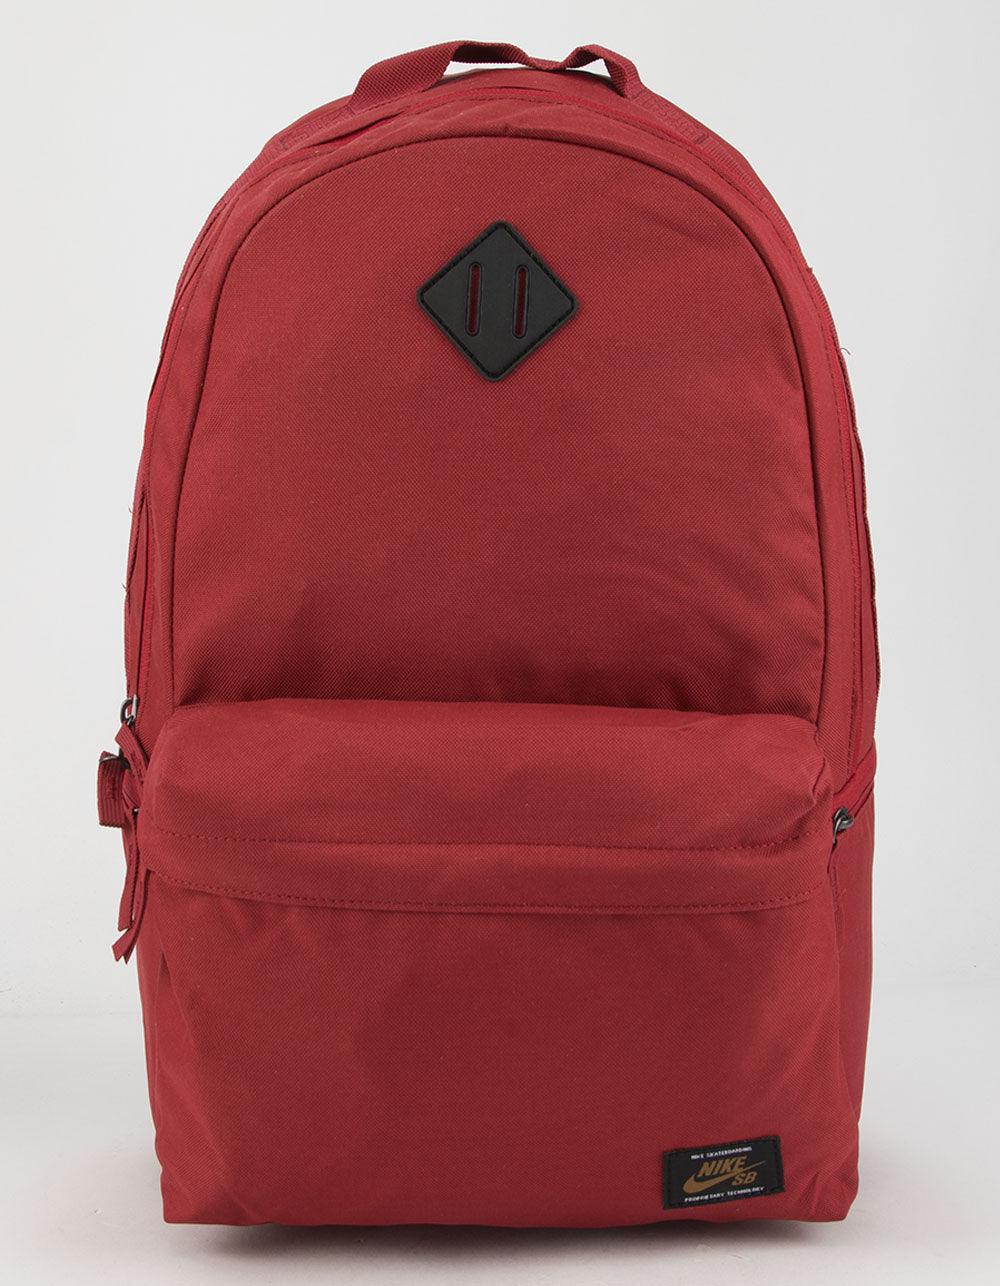 NIKE SB Icon Crimson Backpack